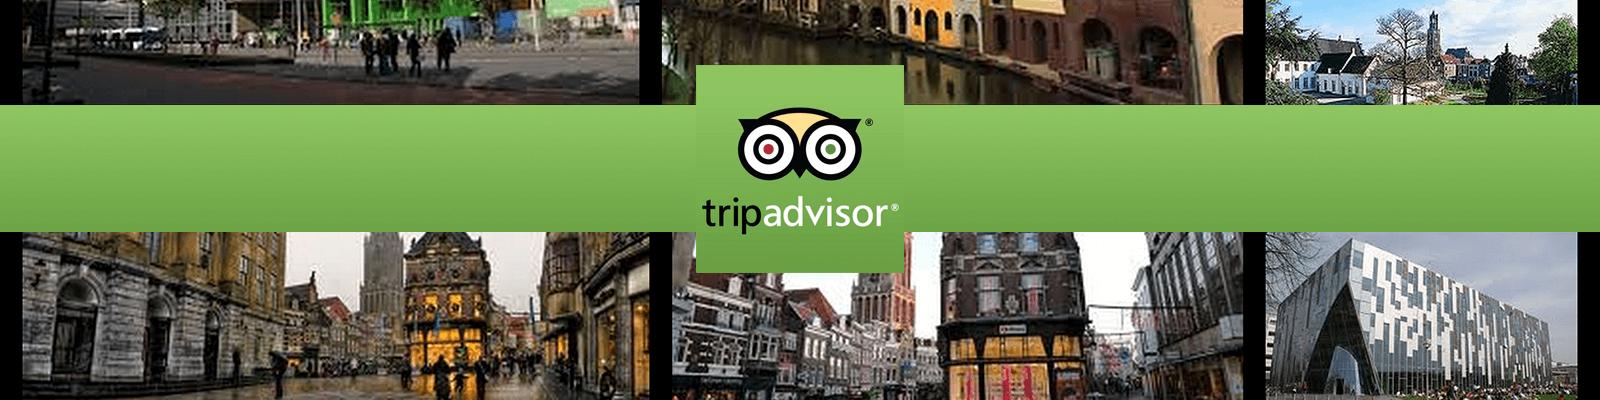 app like trip adviser